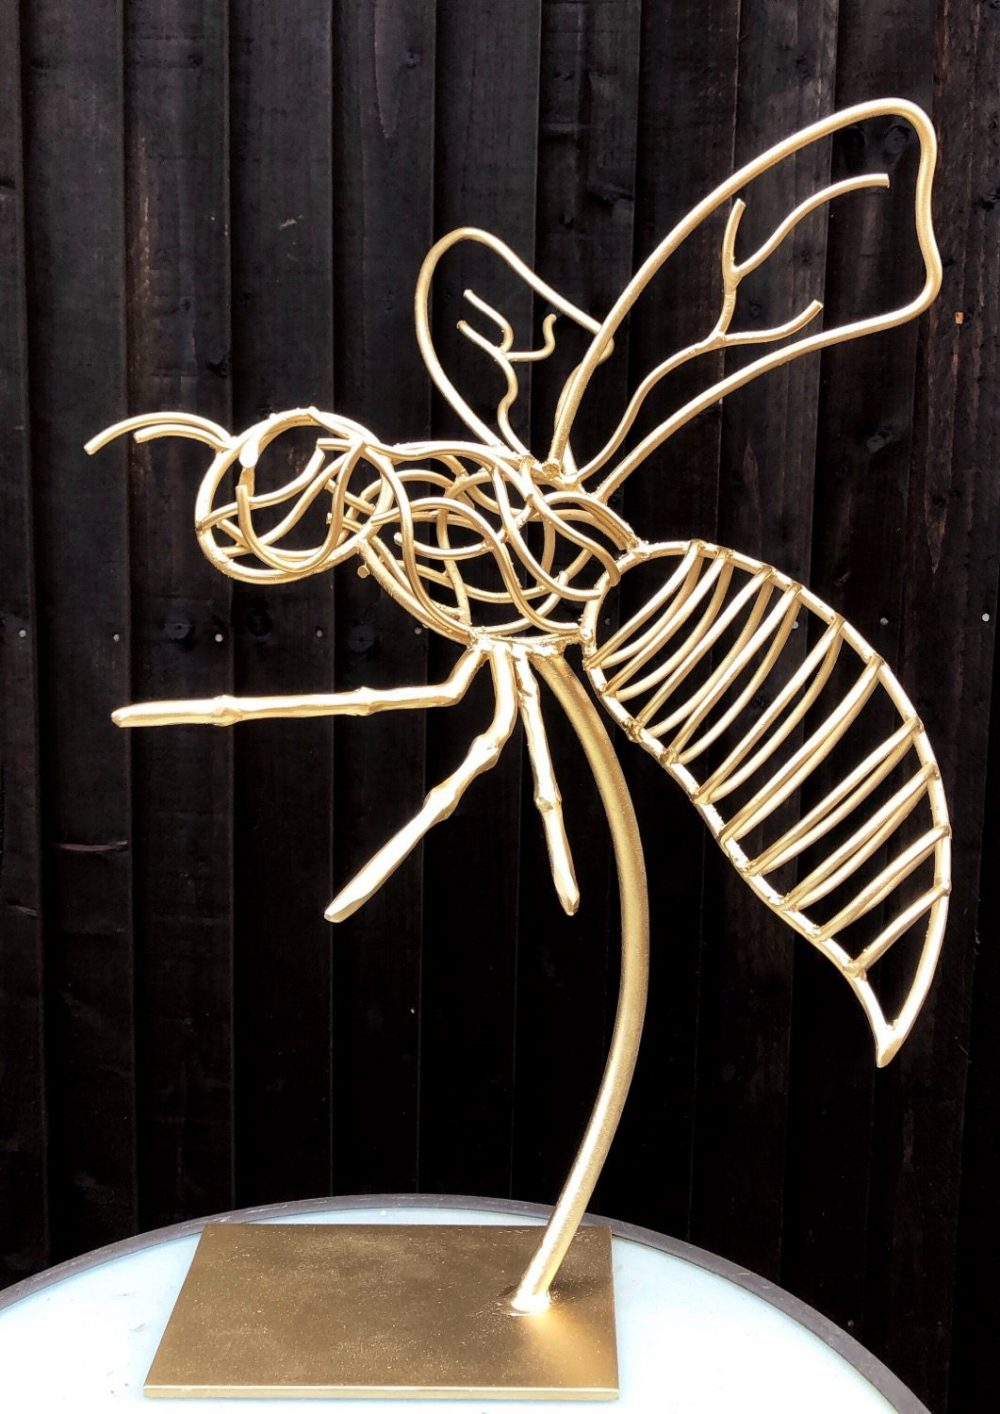 Portrait View Of Wasps Sculpture